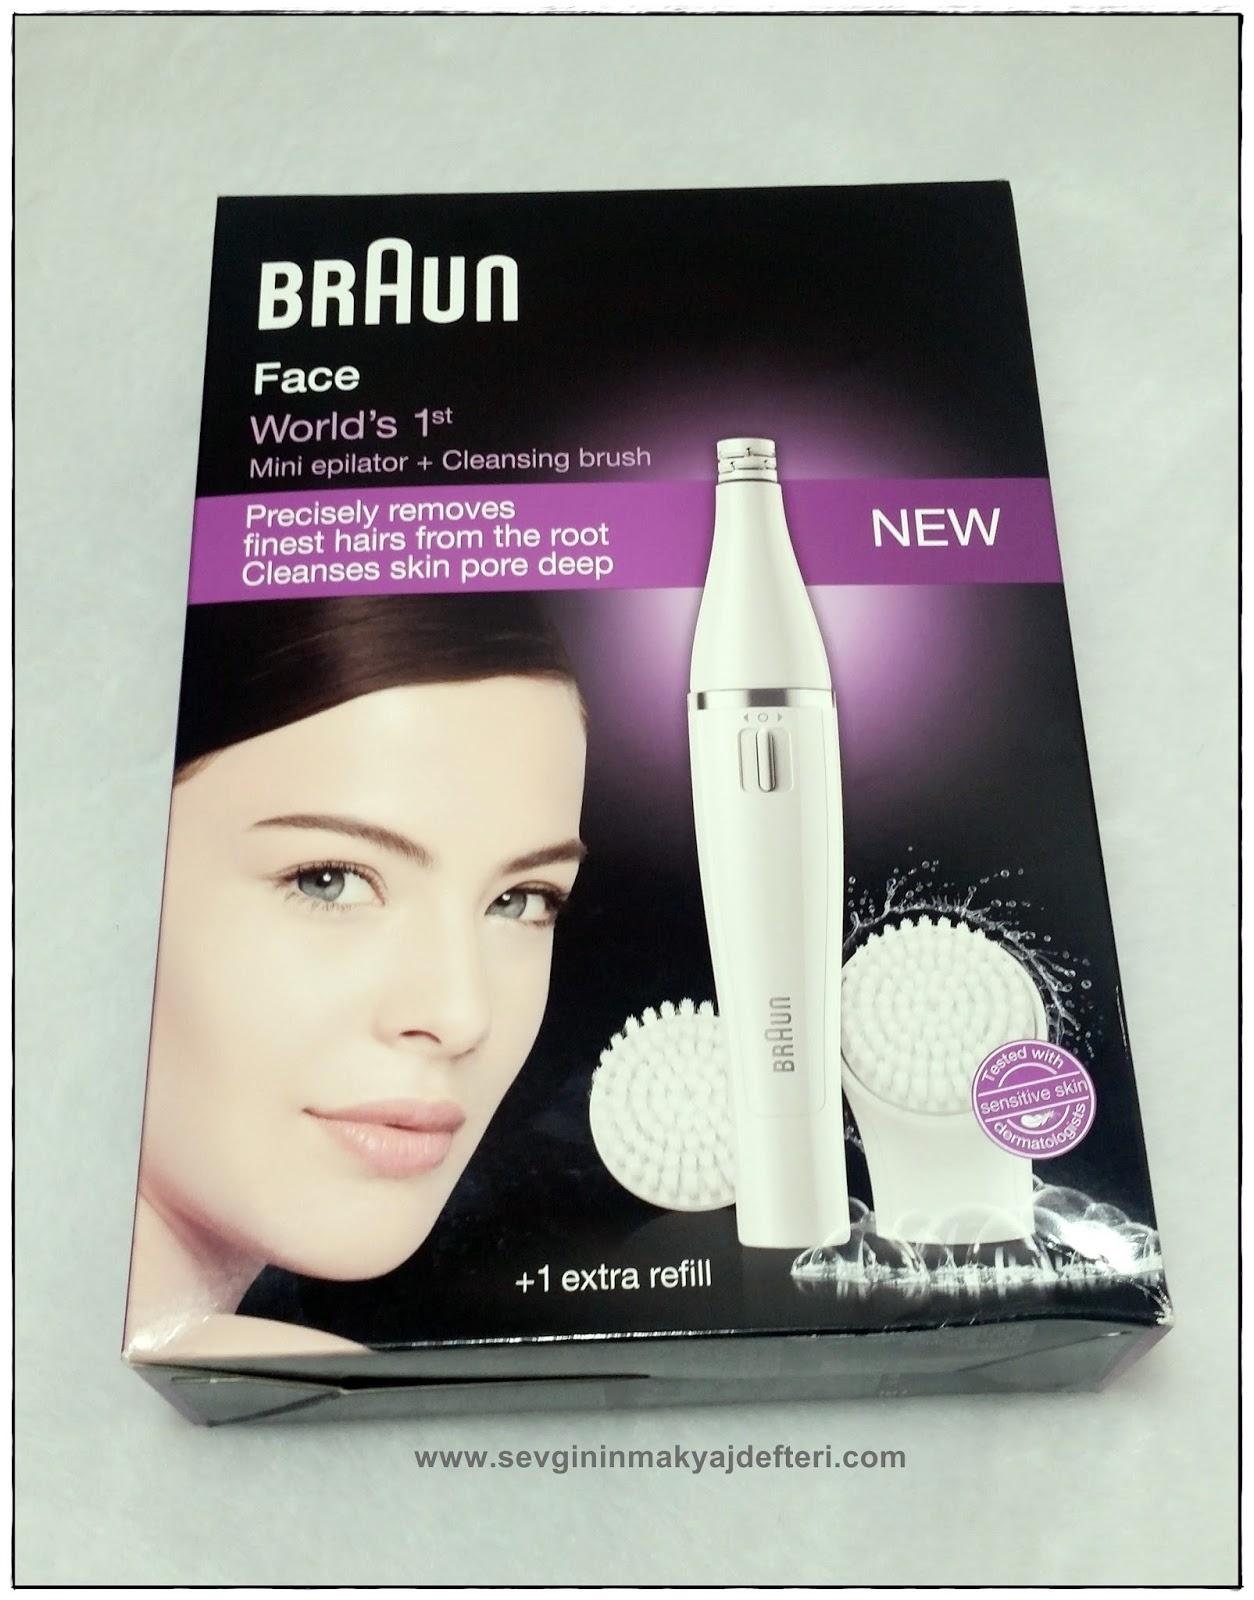 Braun Face Mini Epilatör & Cleansing Brush